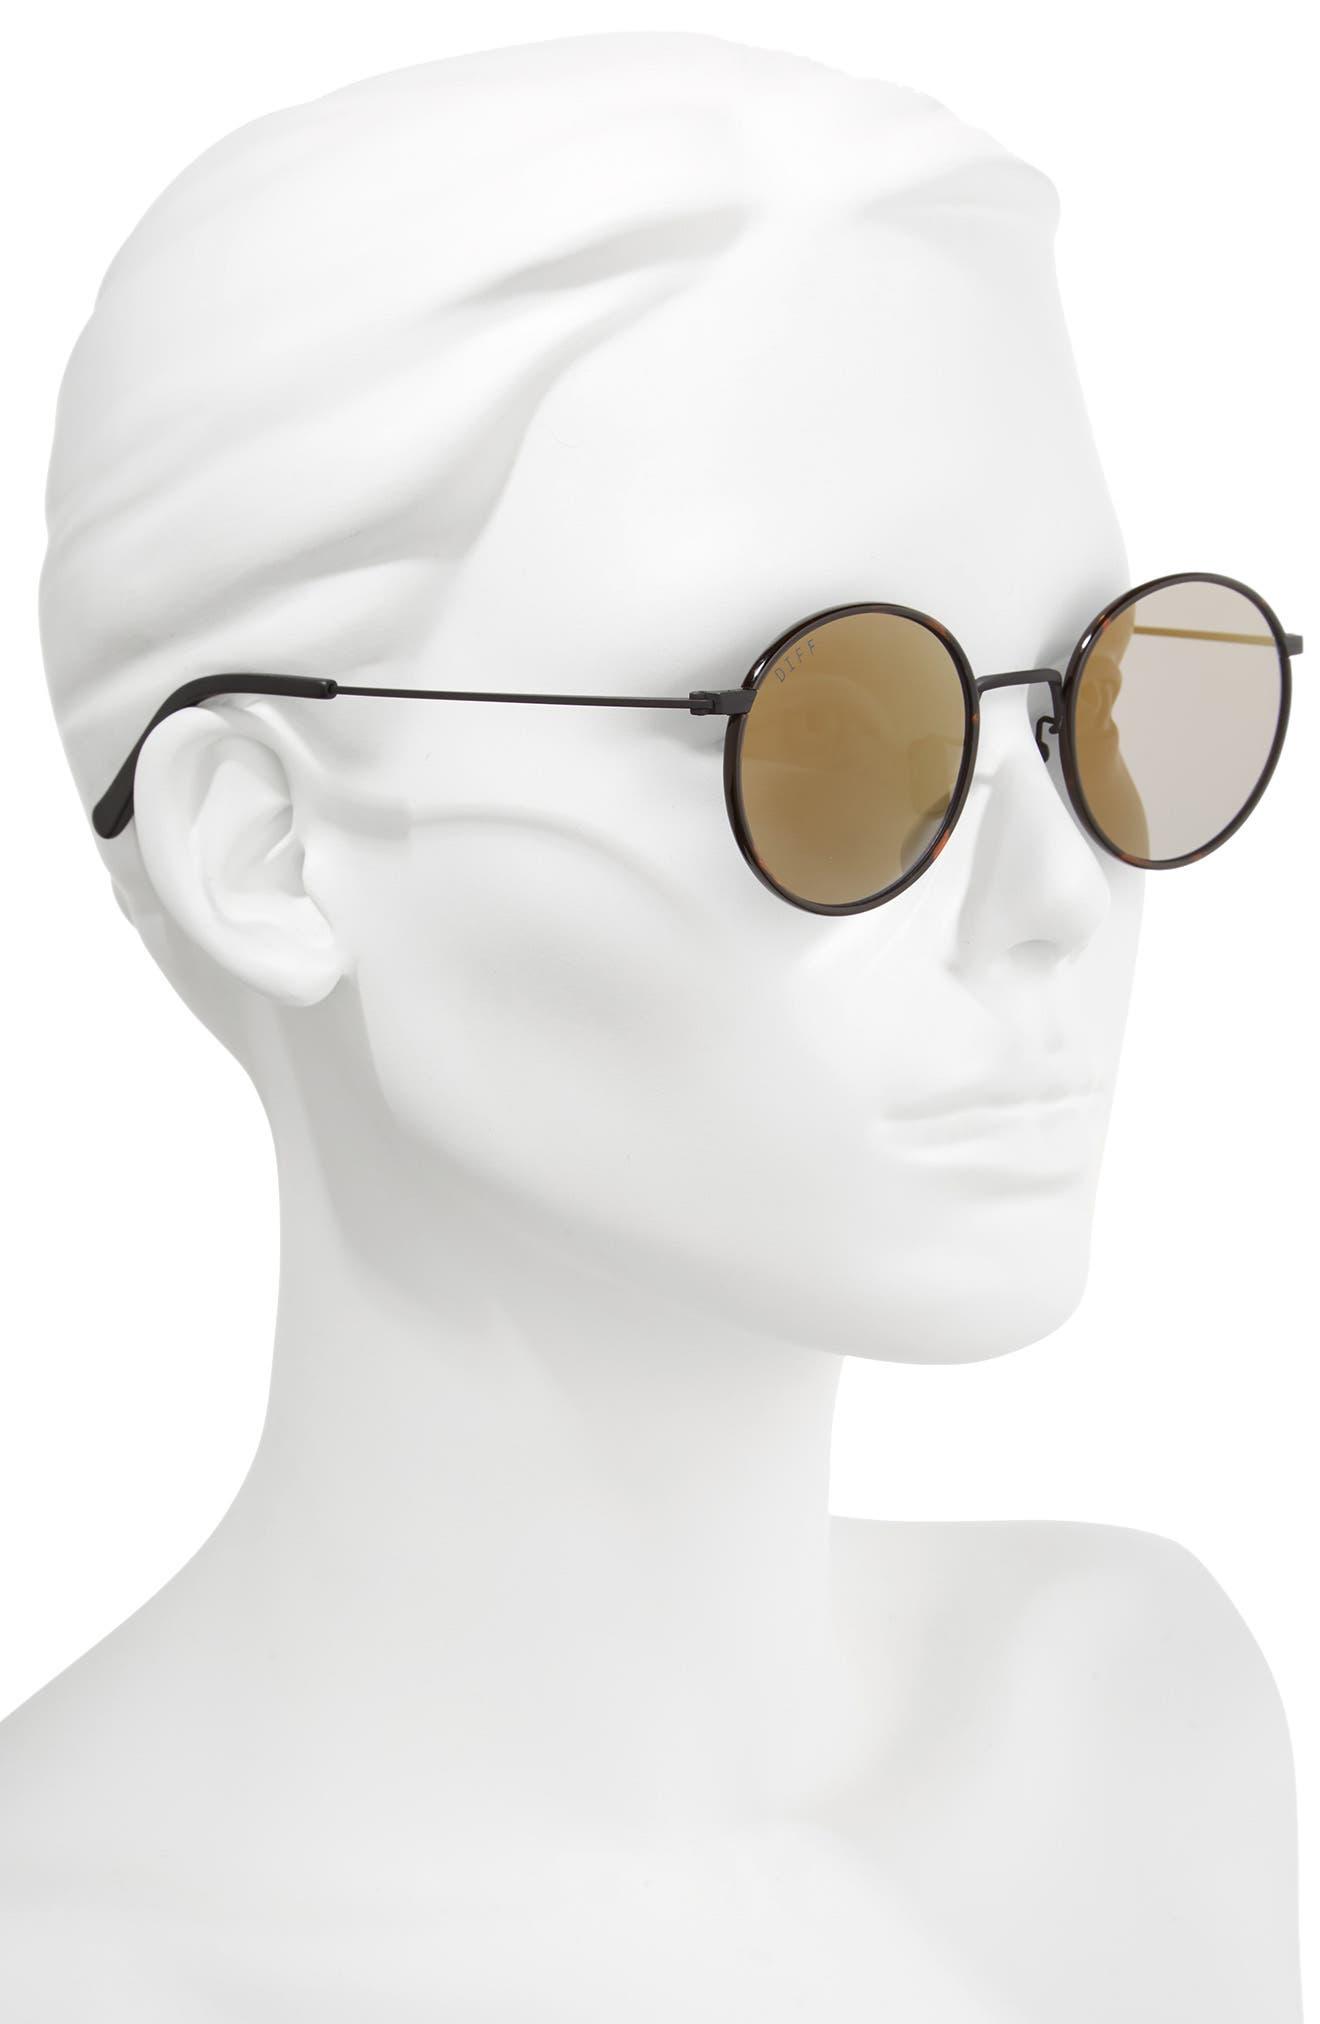 Daisy 57mm Polarized Round Lens Sunglasses,                             Alternate thumbnail 2, color,                             Matte Black/ Grey Blue